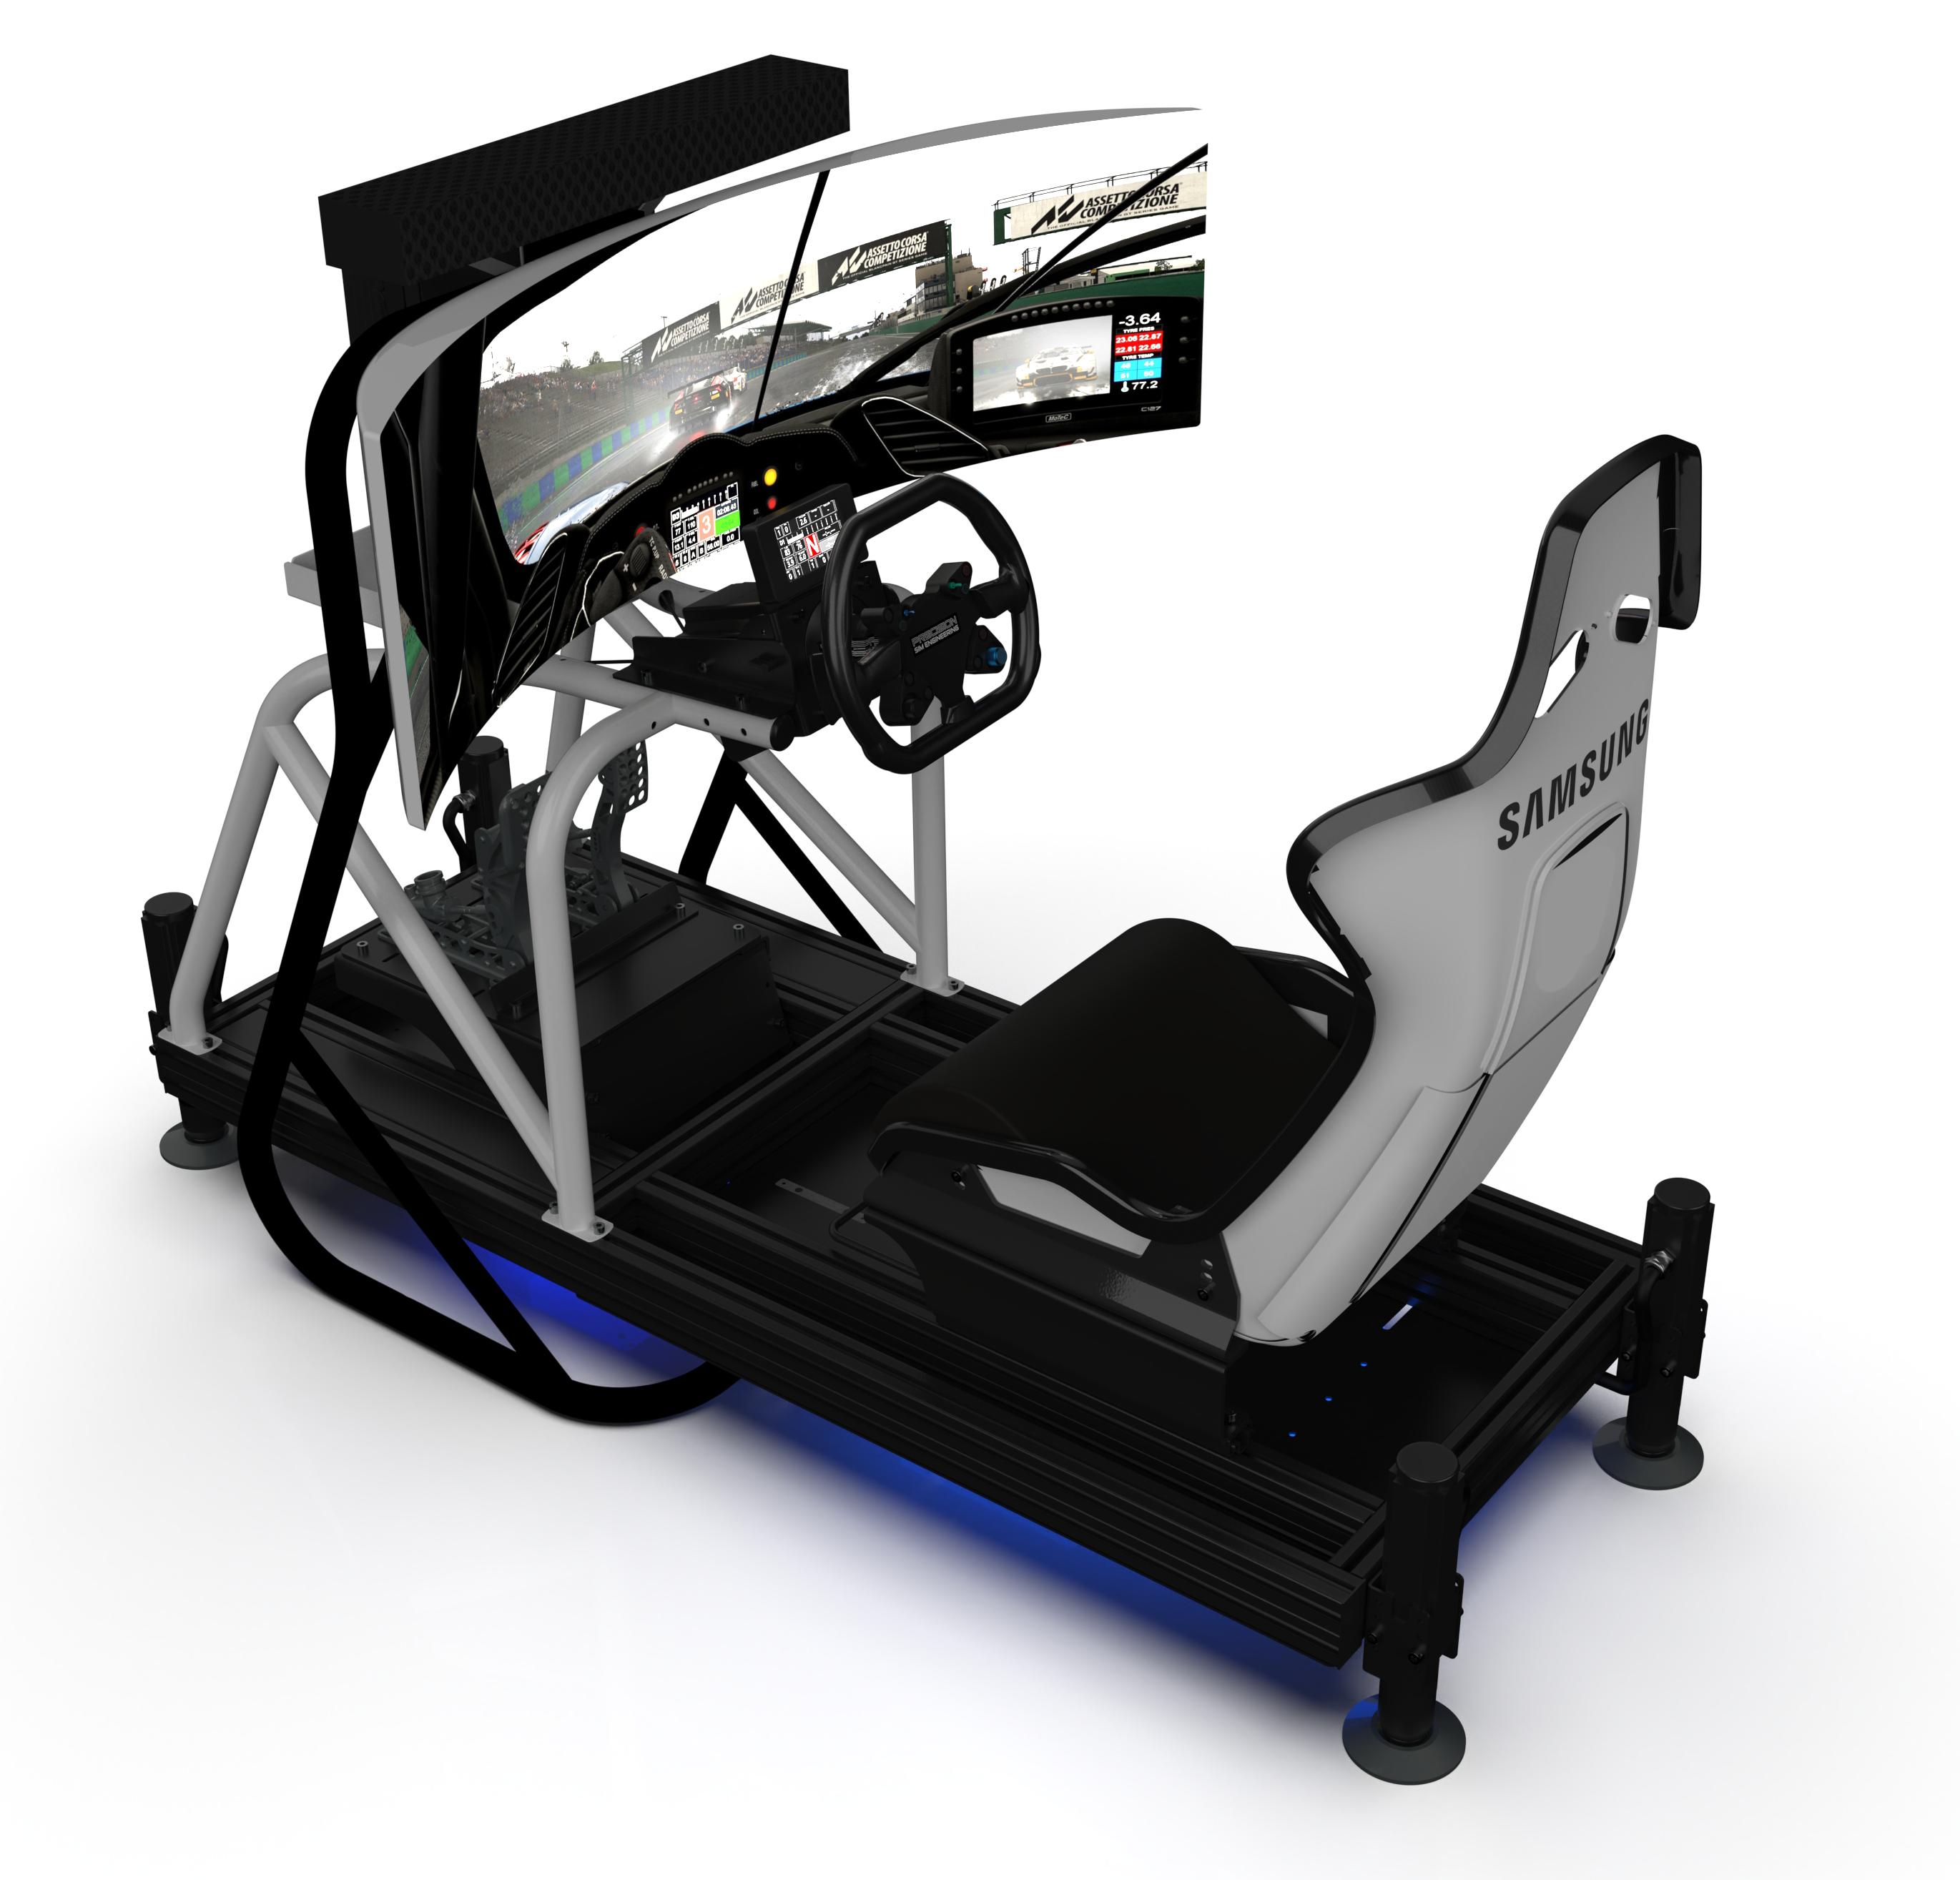 AXSIM Samsung G9 Simulator